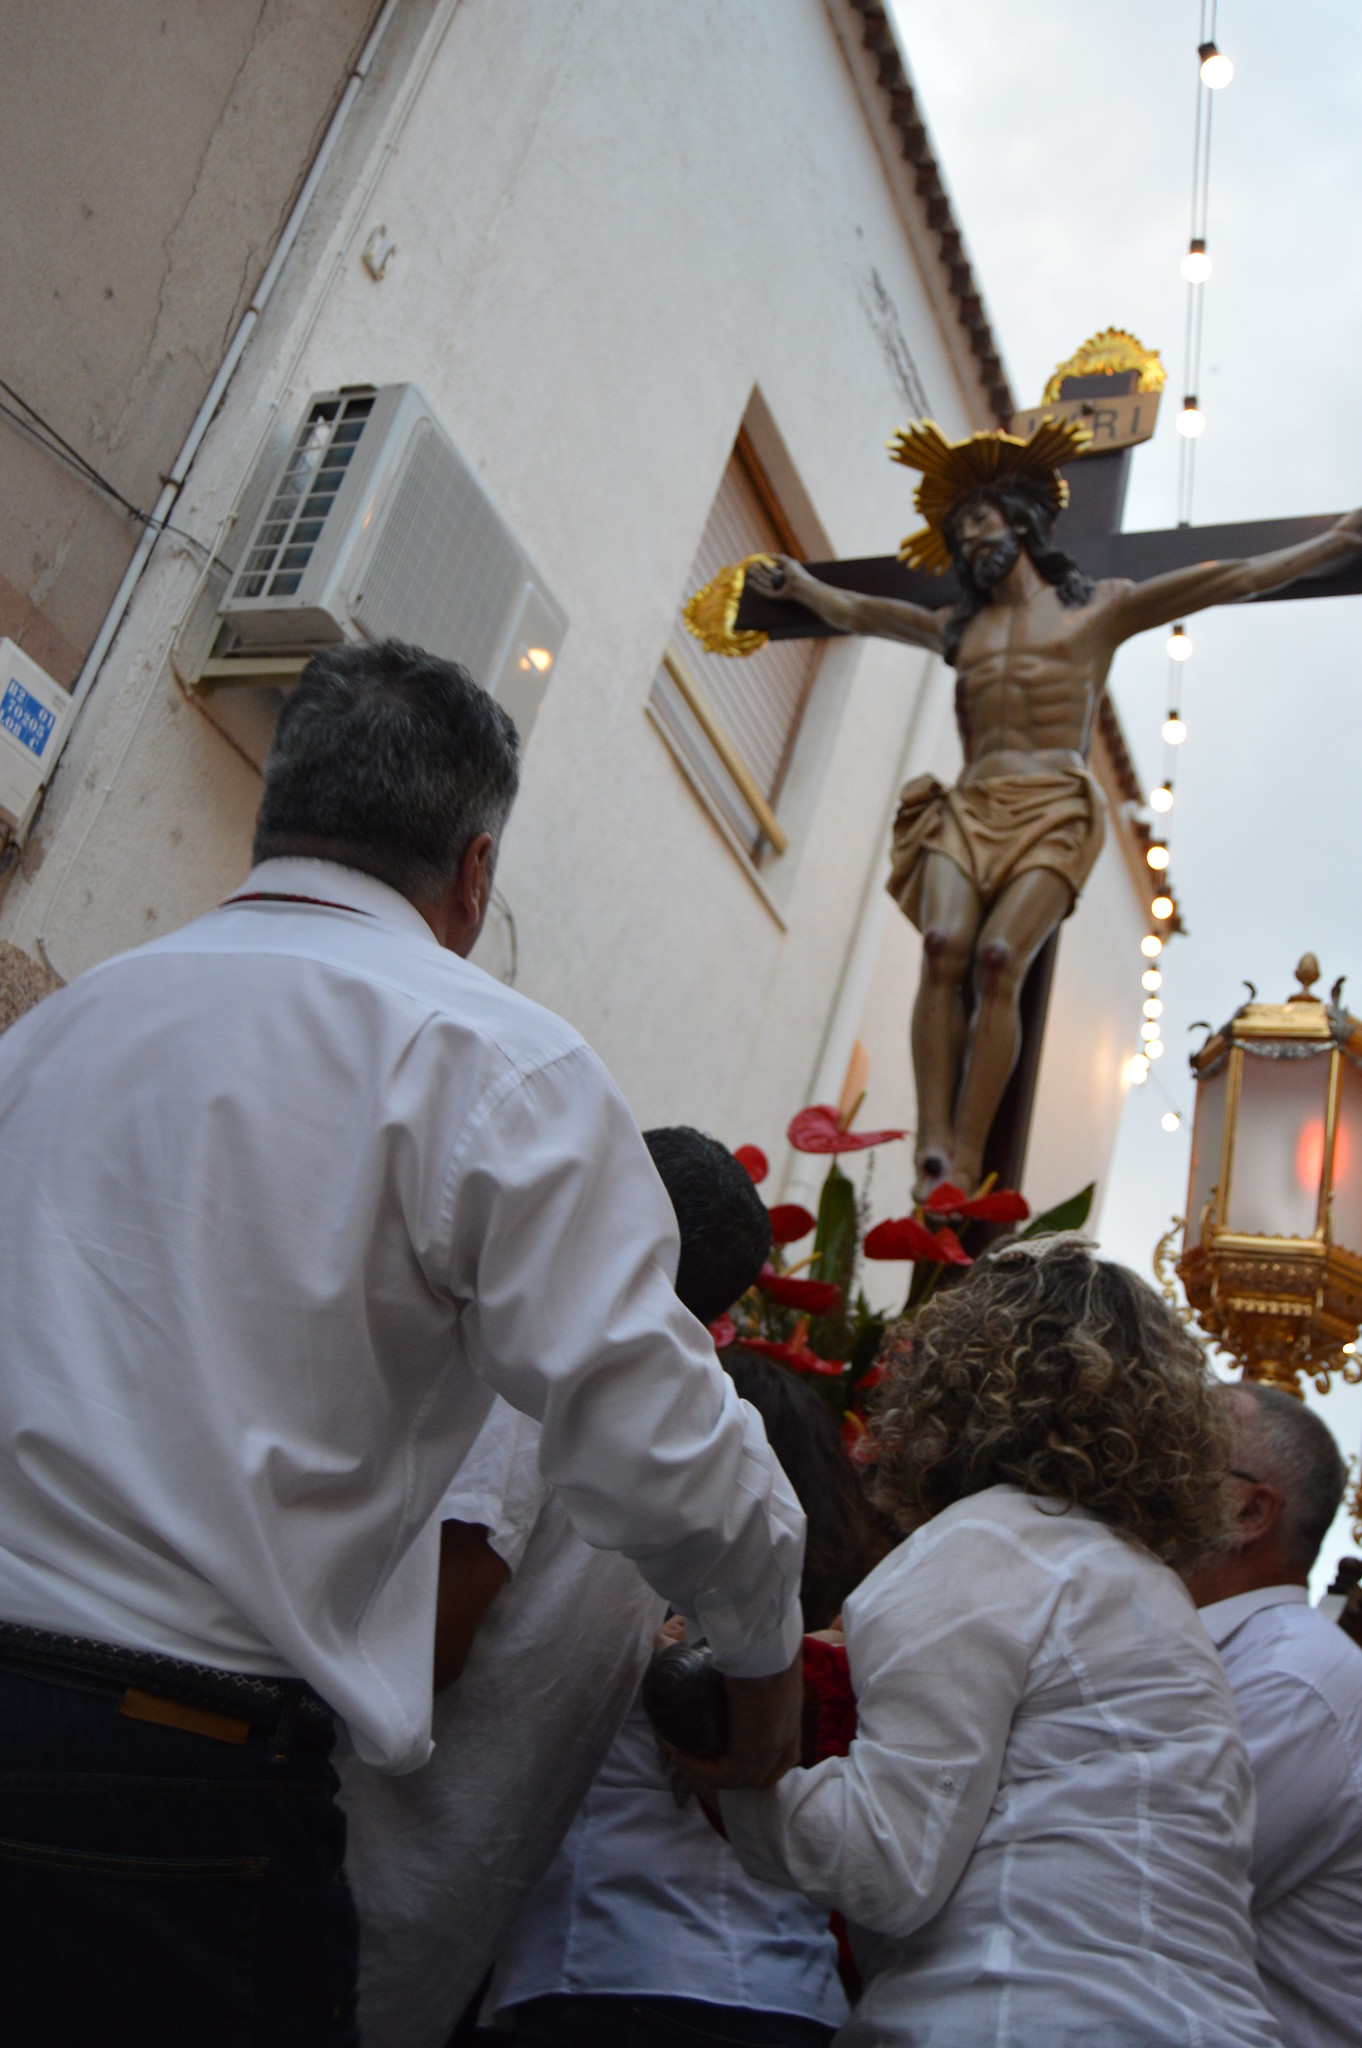 (2019-07-07) Procesión de subida - Adrián Romero Montesinos (27)